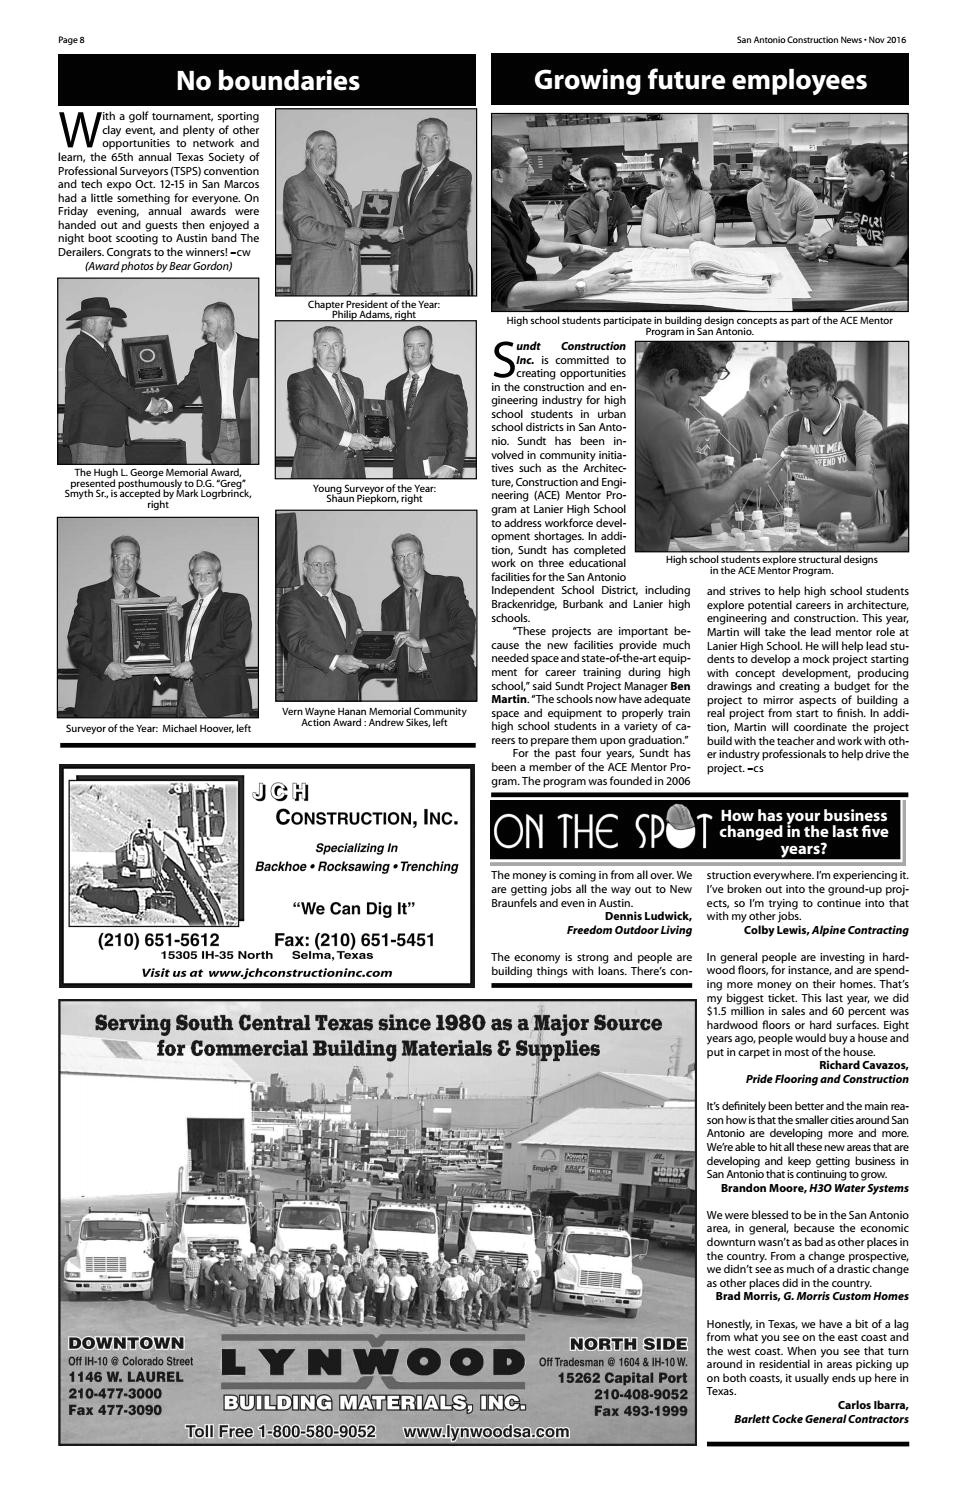 San Marcos Tx Local News San Antonio November 2016 by